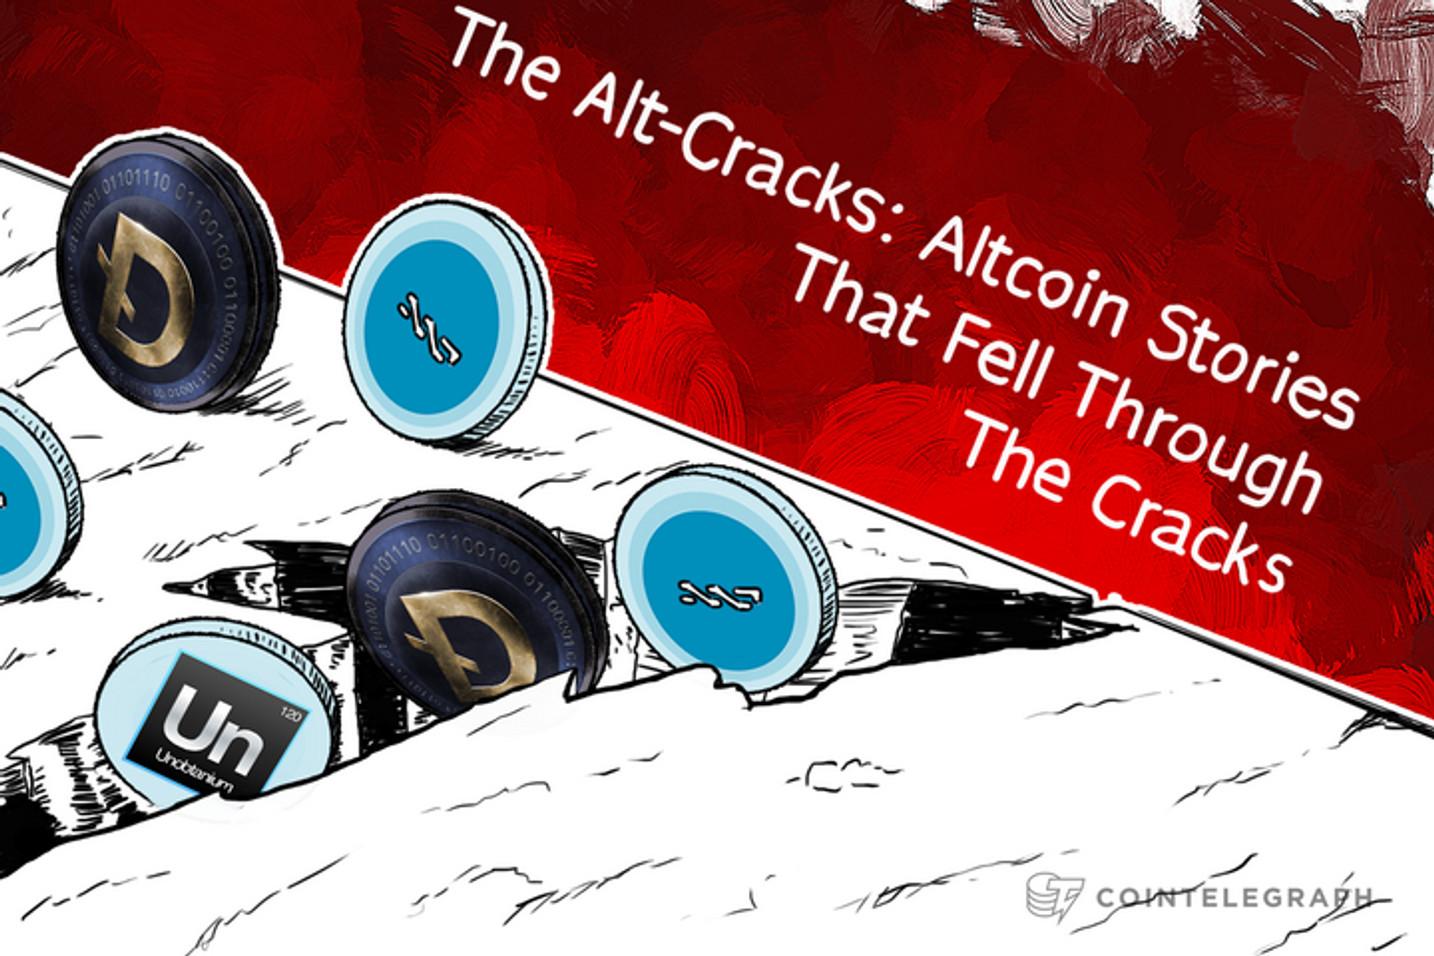 The Alt-Cracks: Altcoin Stories That Fell Through The Cracks